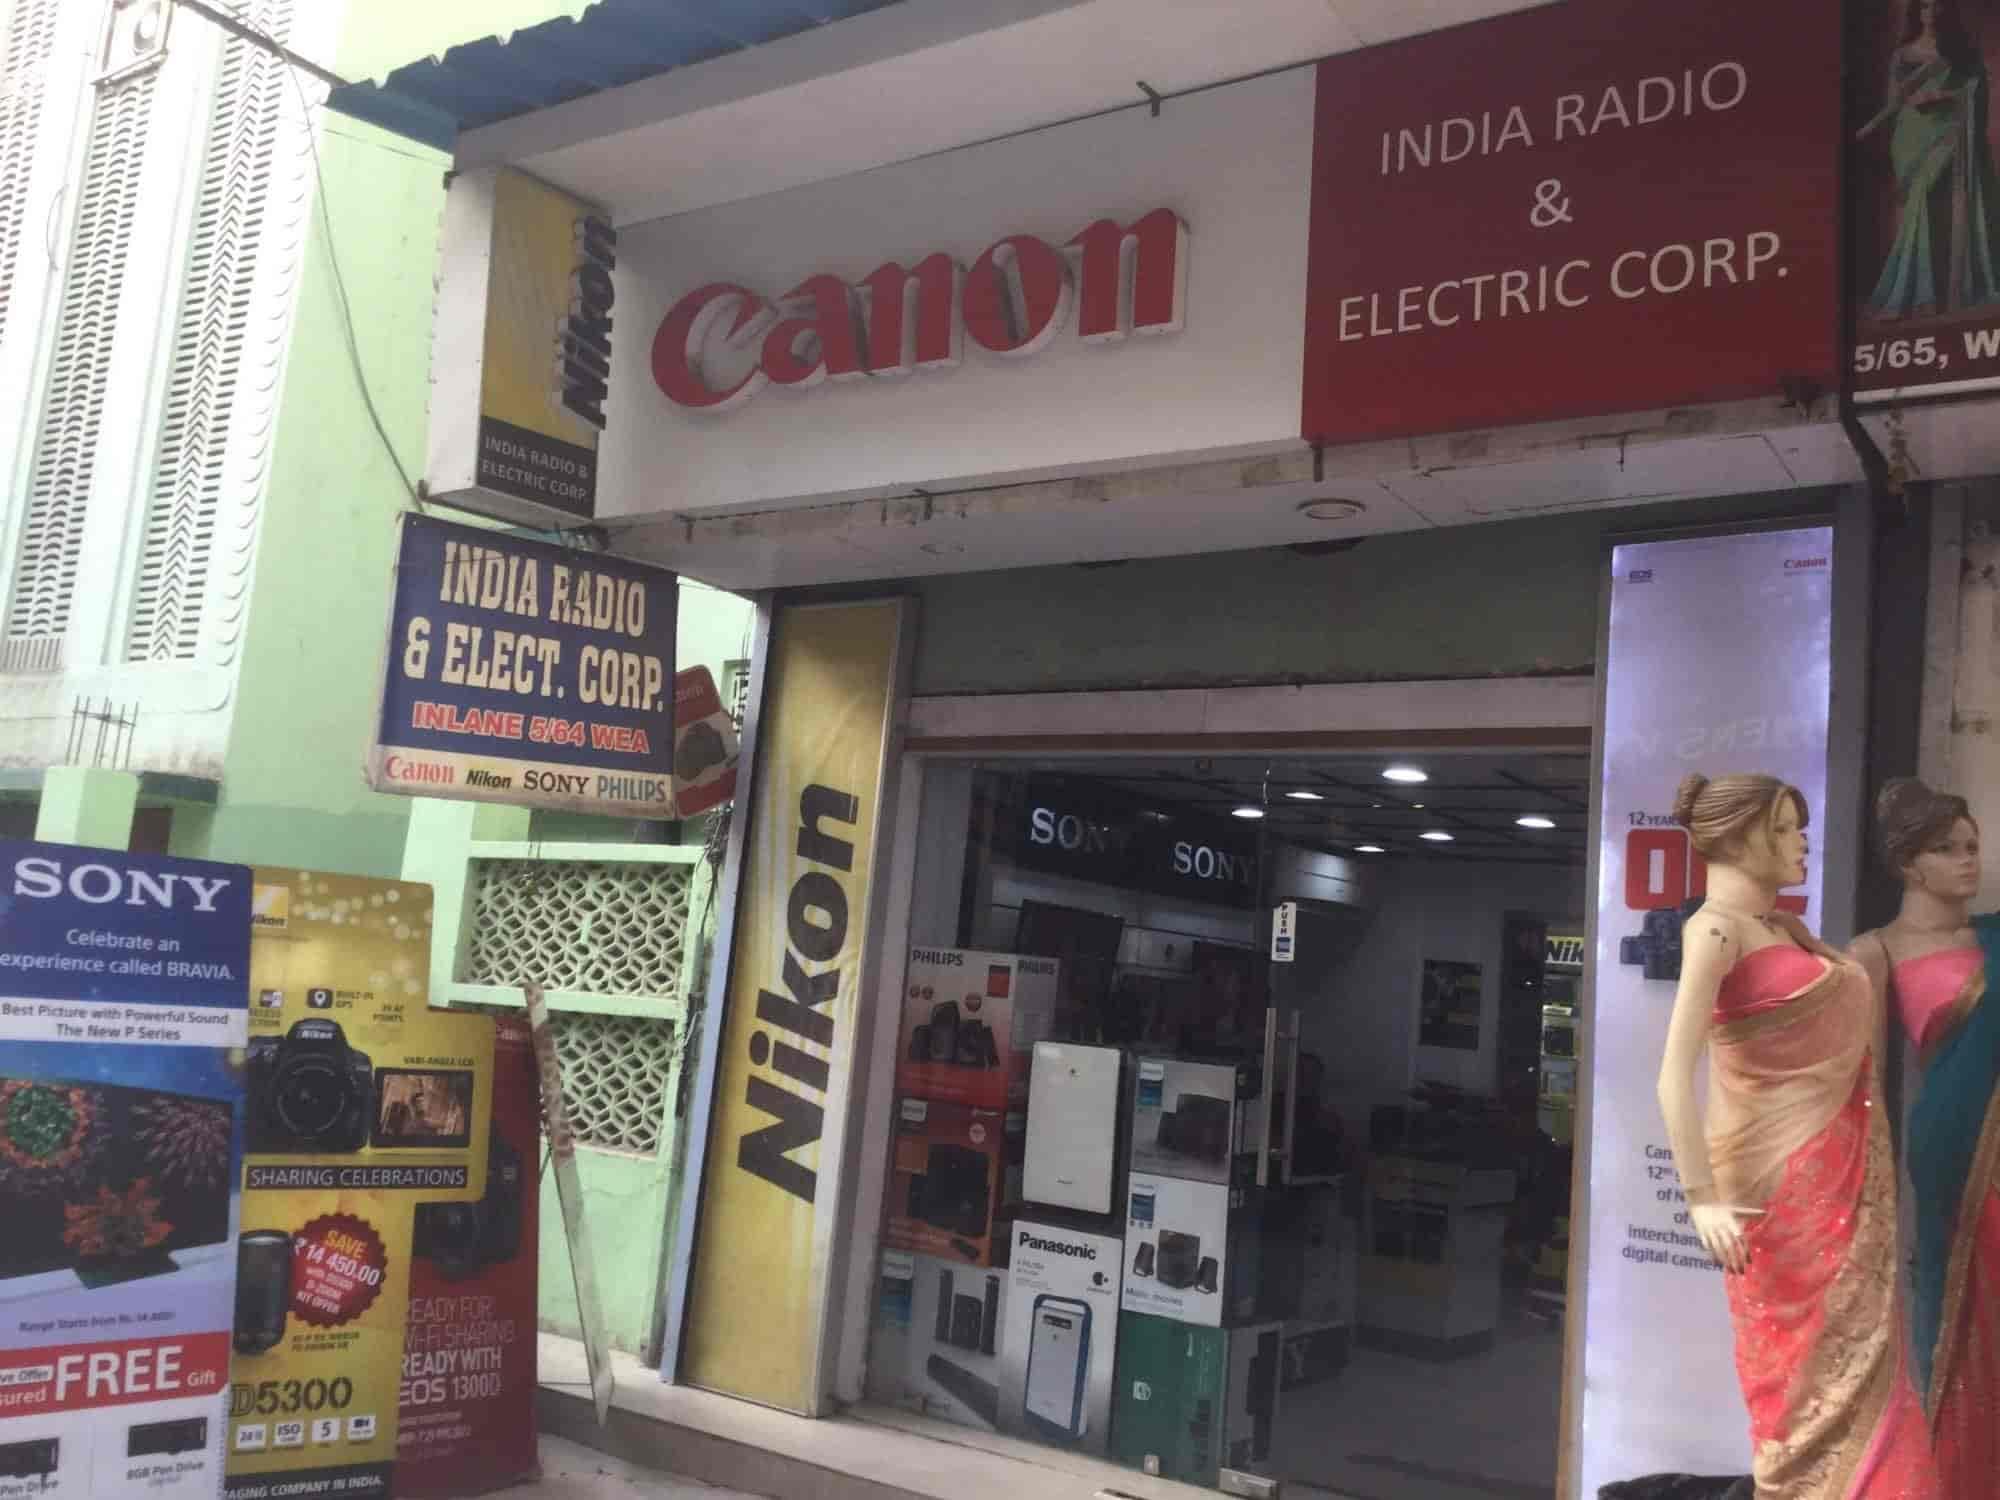 Camera Stores in Naraina, Delhi - Camera Dealers -Justdial